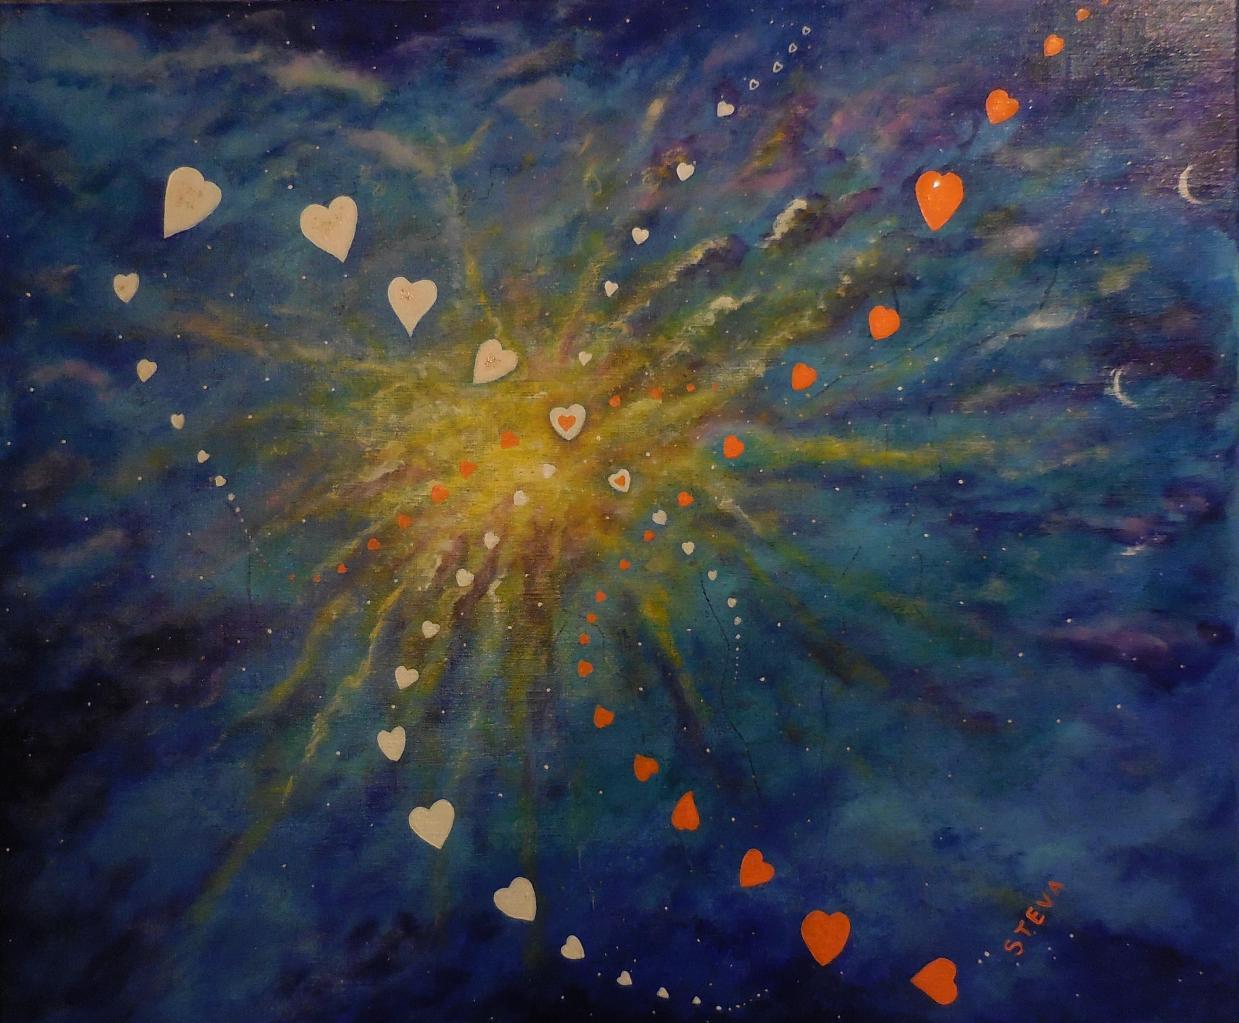 Hauts les coeurs! 50x70 cm 2015